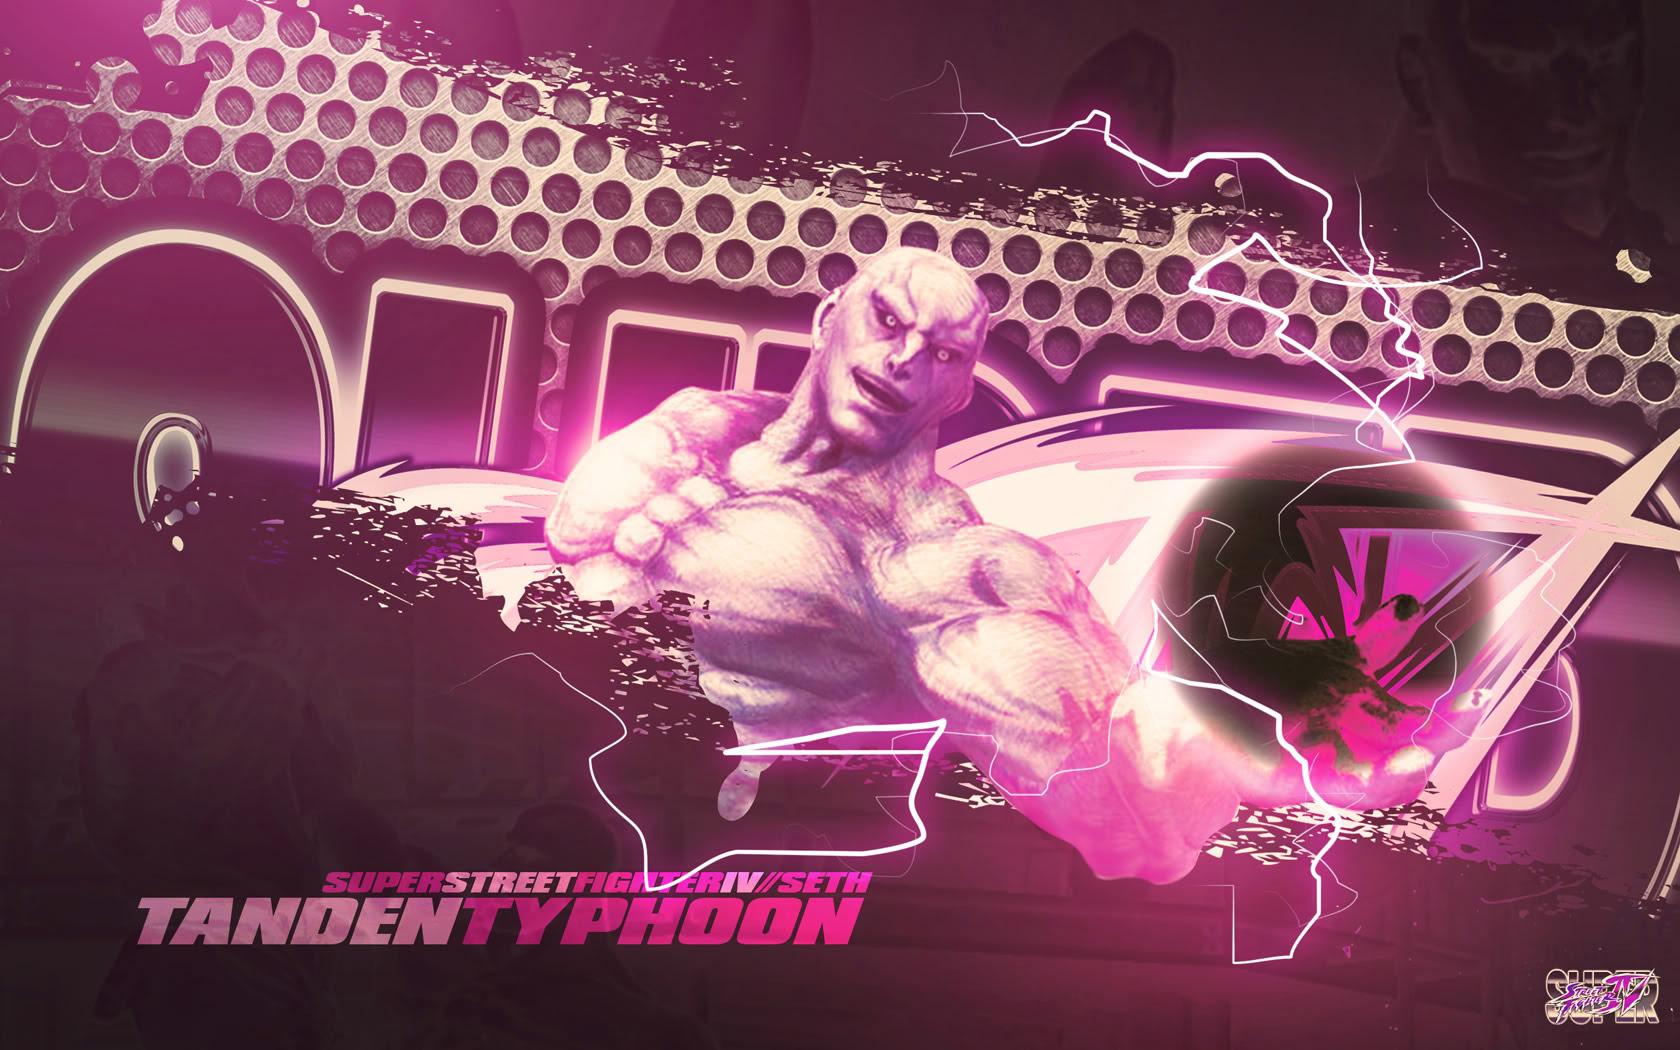 Seth Super Street Fighter 4 wallpaper by BossLogic